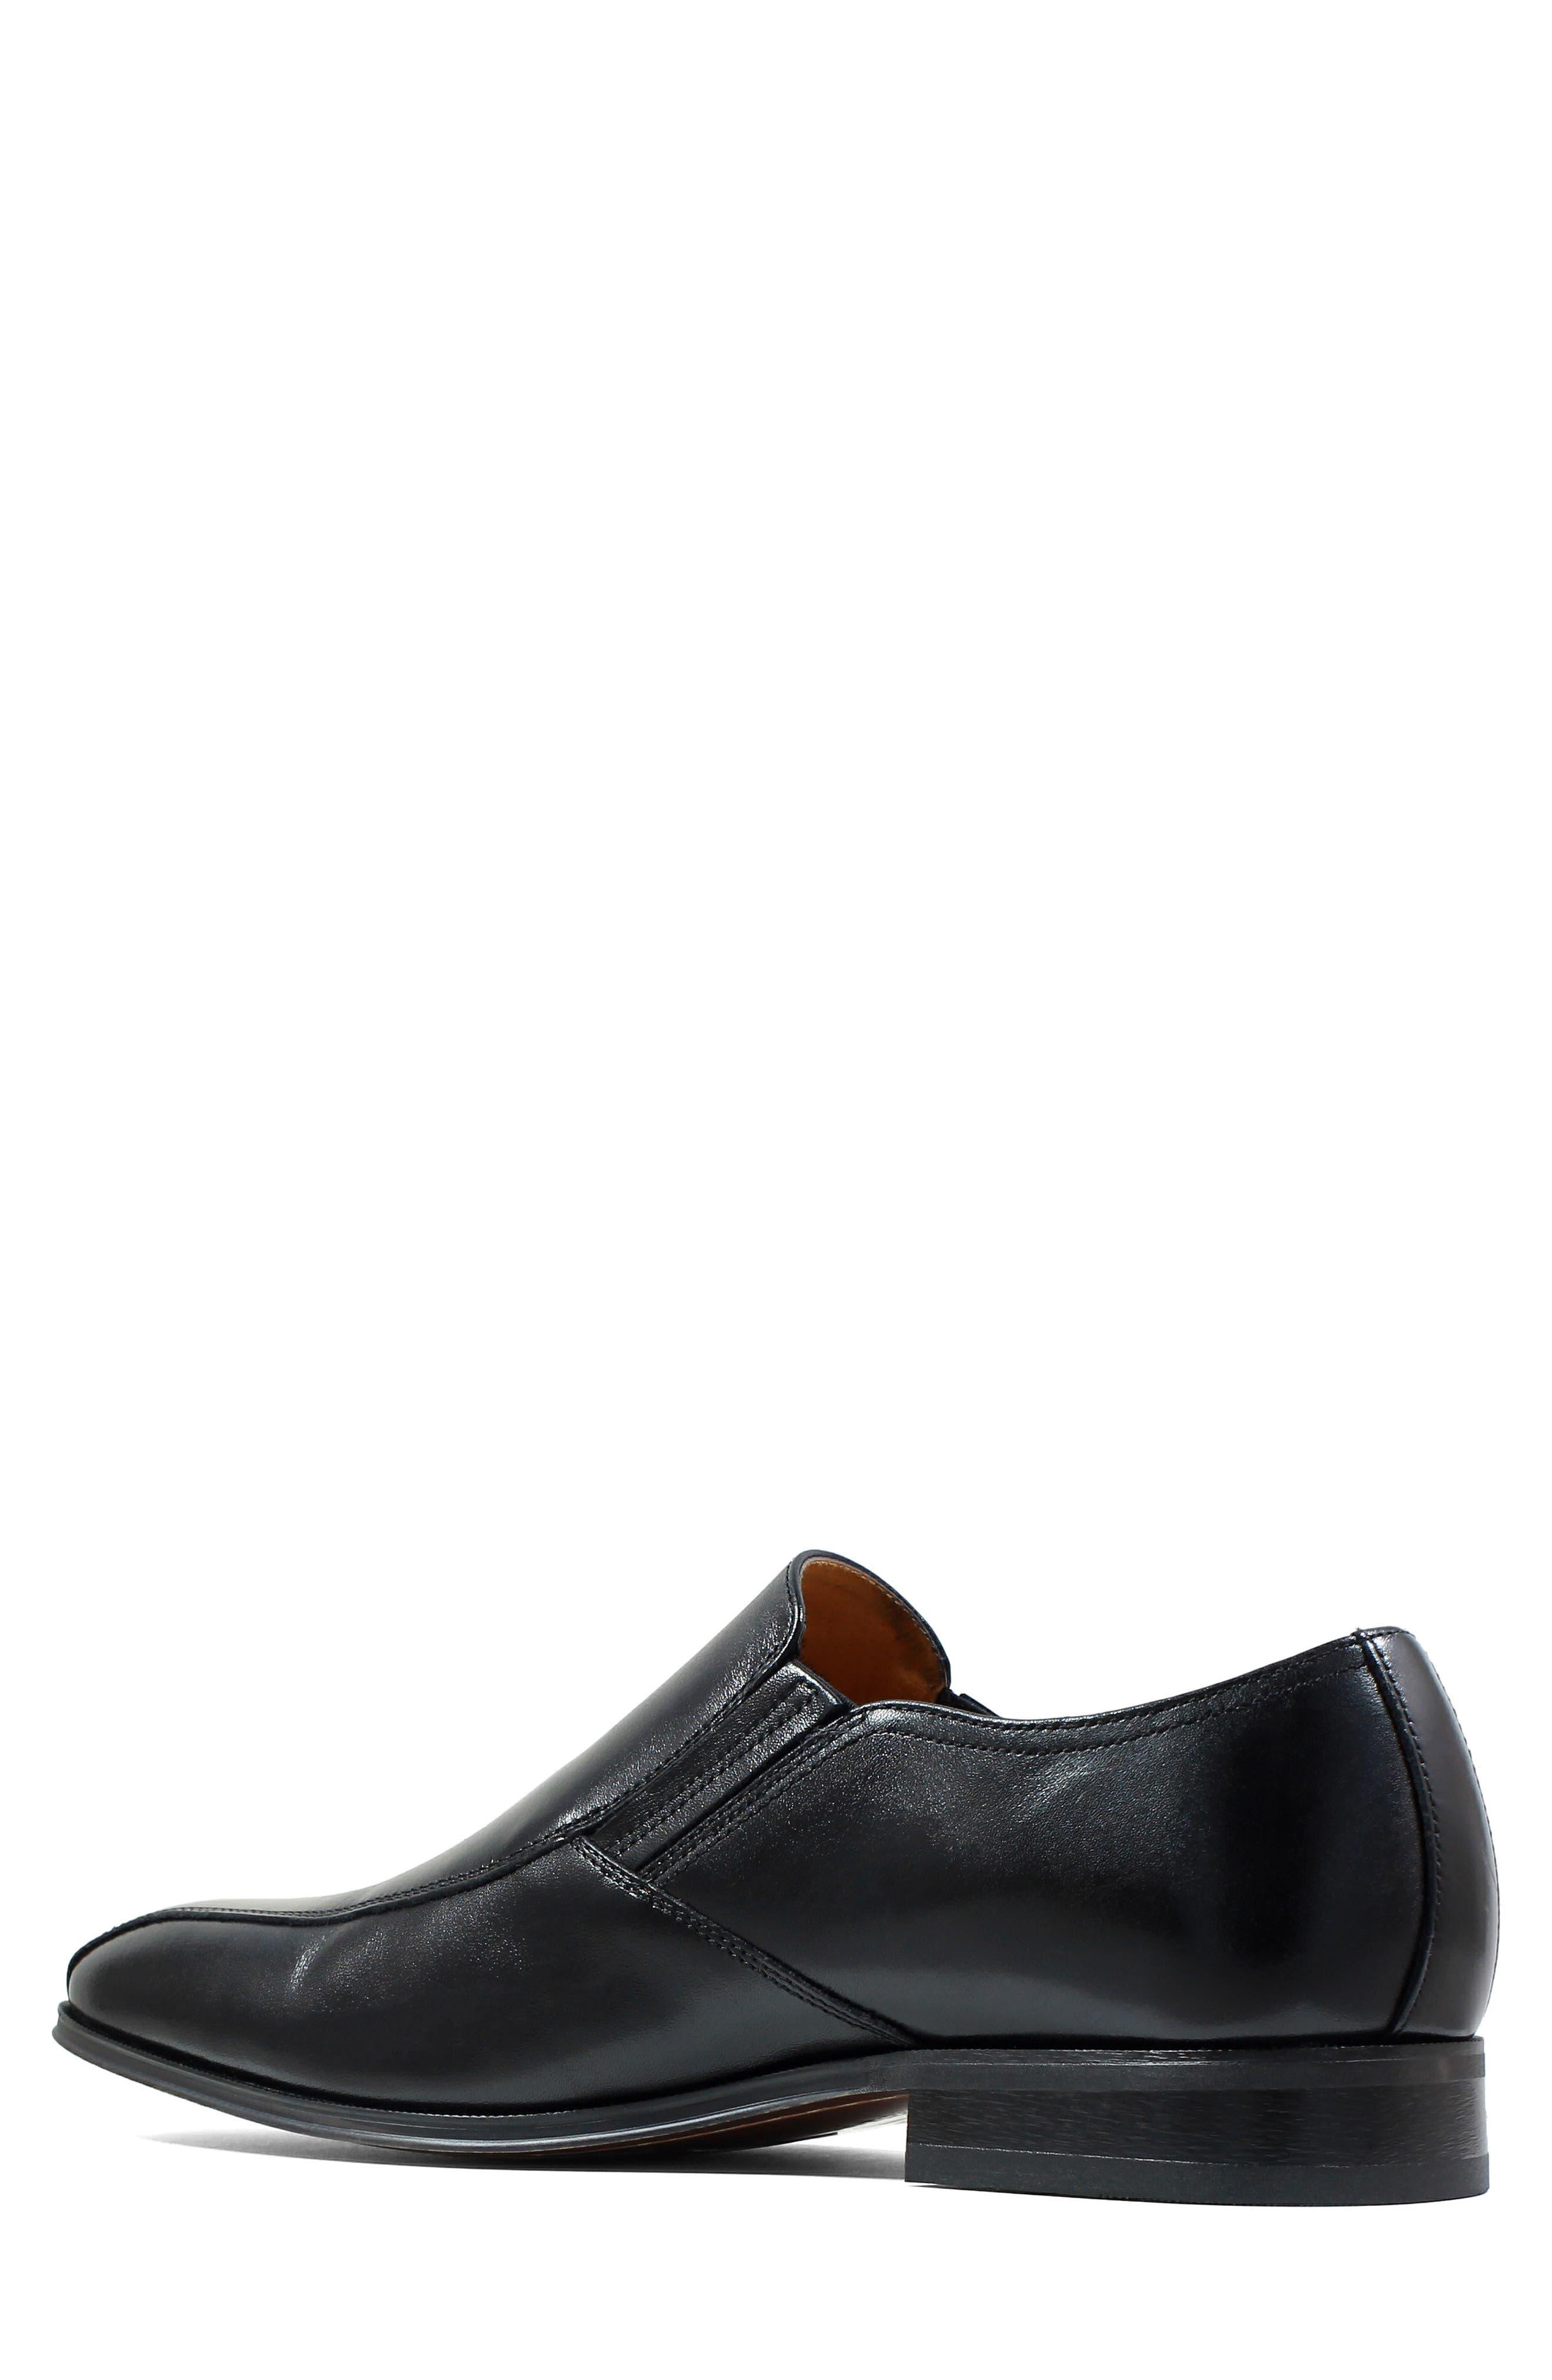 FLORSHEIM, Corbetta Venetian Loafer, Alternate thumbnail 2, color, BLACK